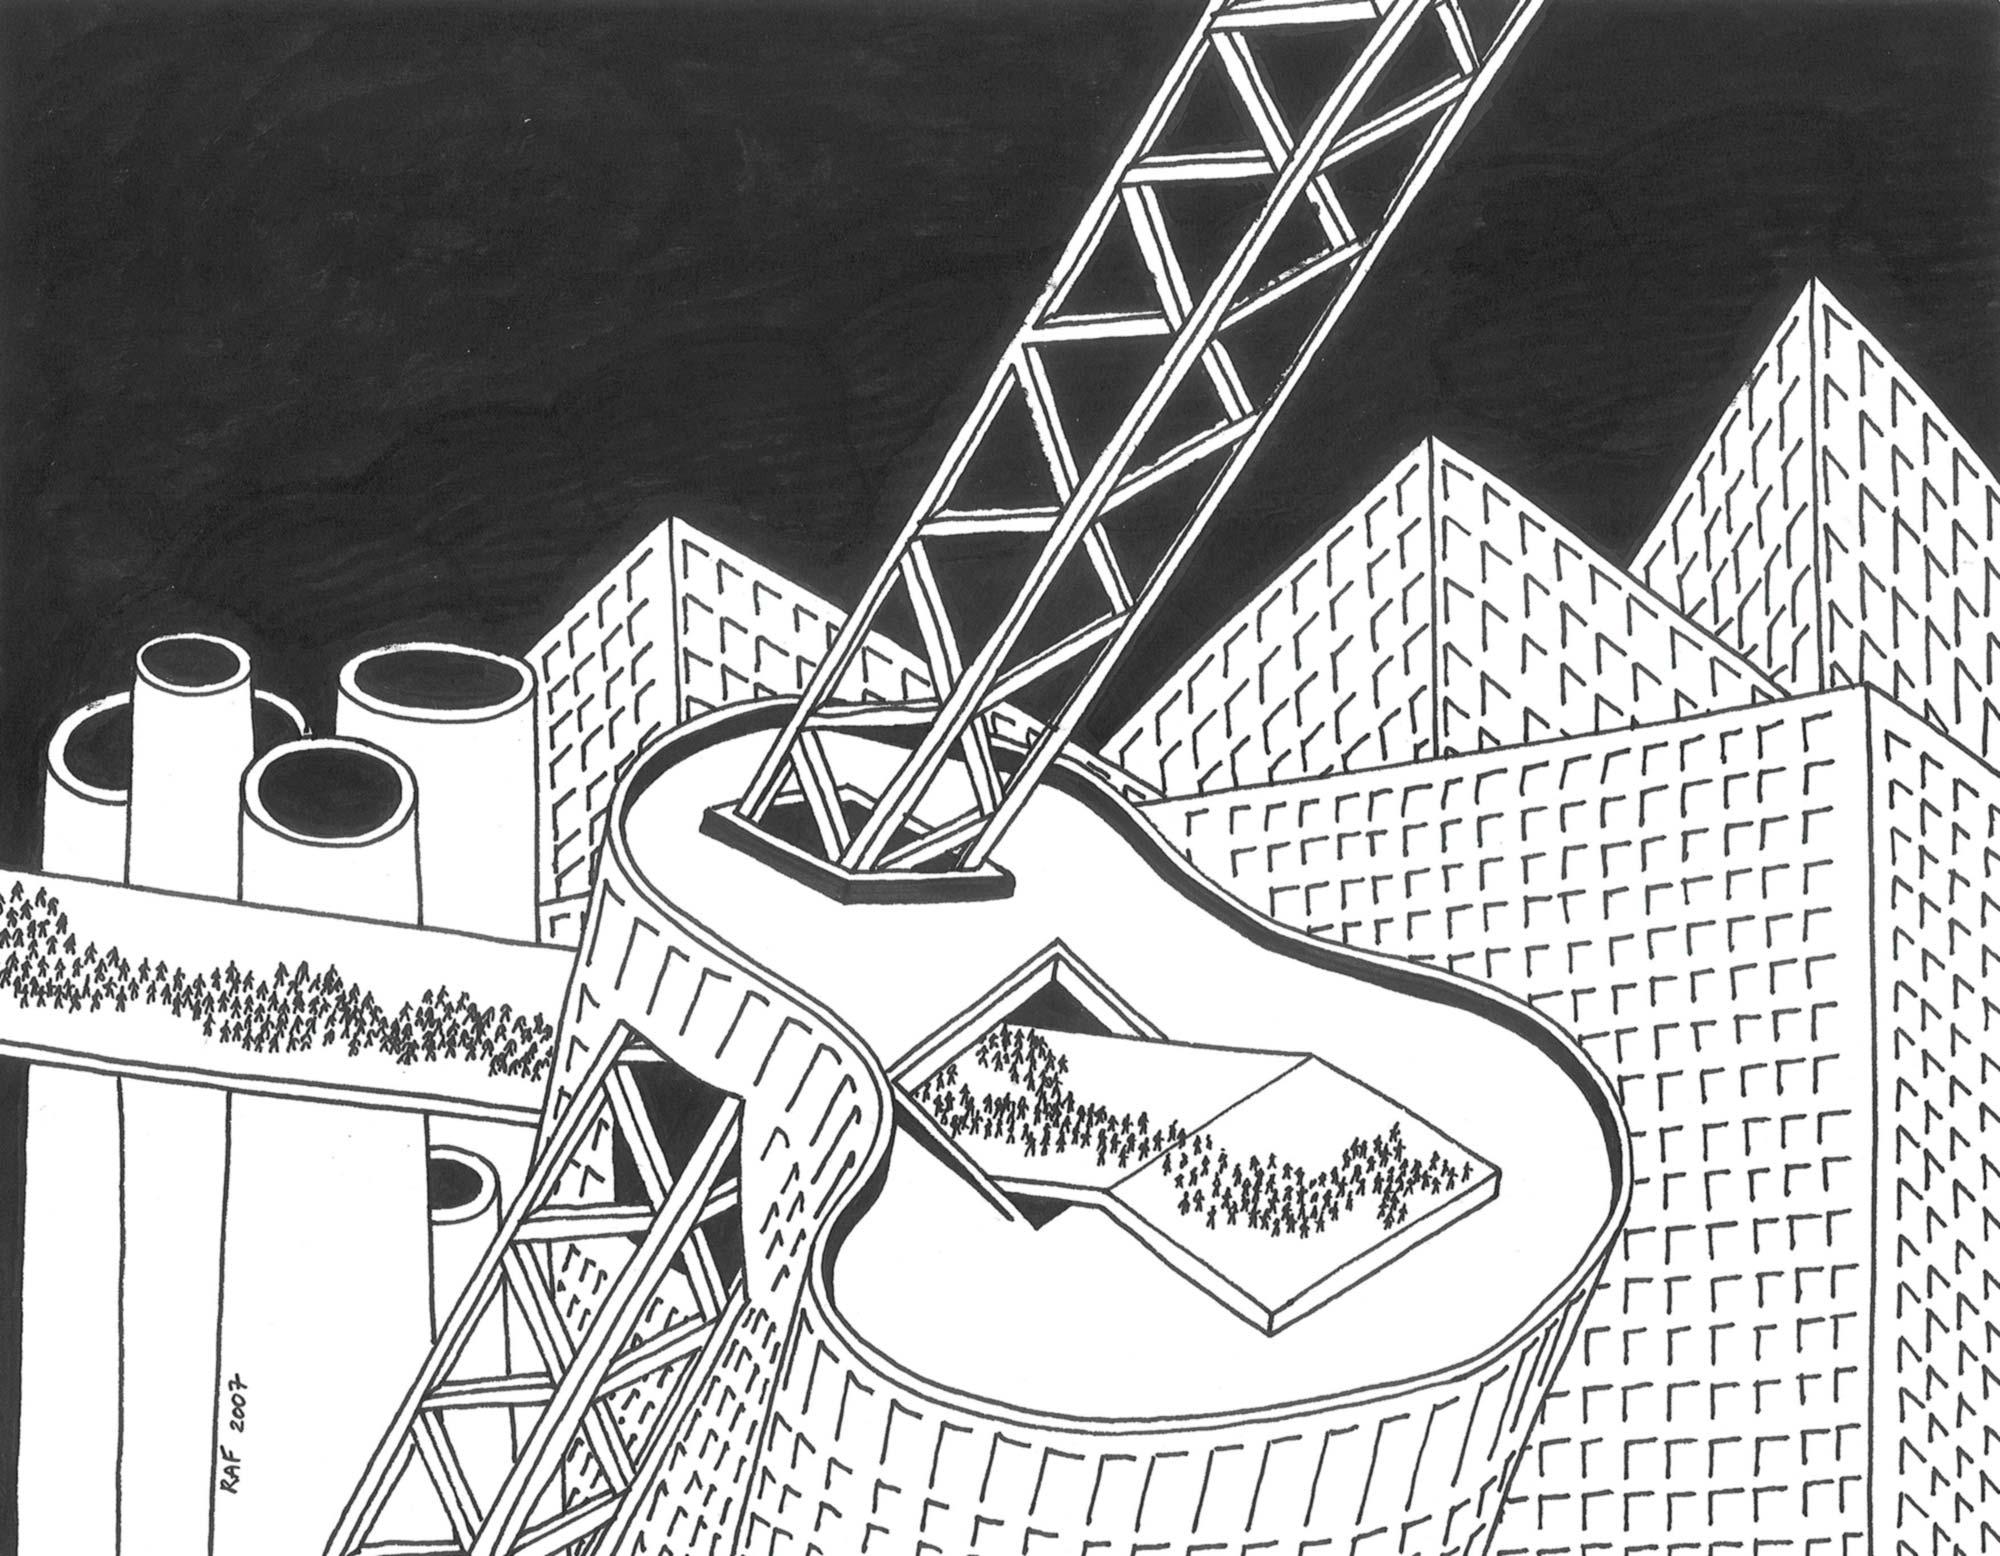 Chaos, dessin, Raf Listowski, 2007